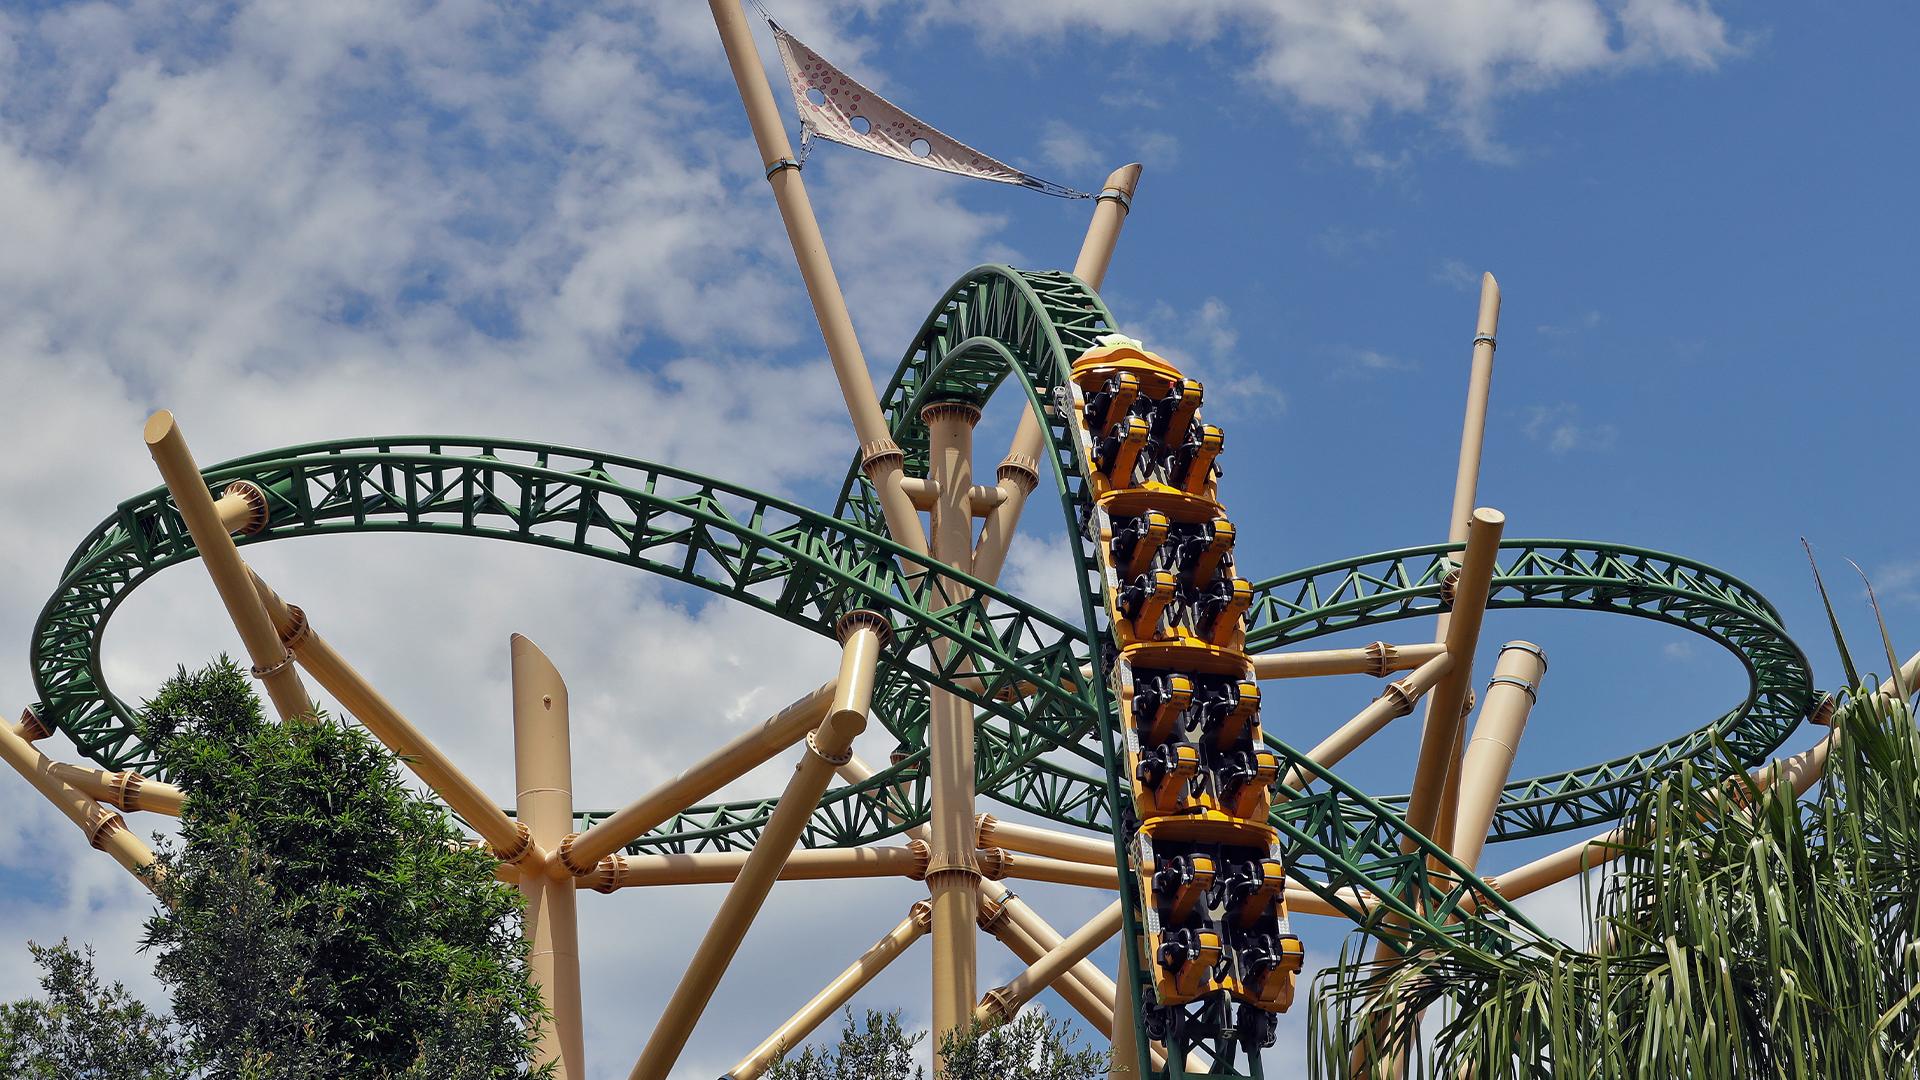 Busch Gardens Adventure Island Ends Temperature Checks For Guests Wfla